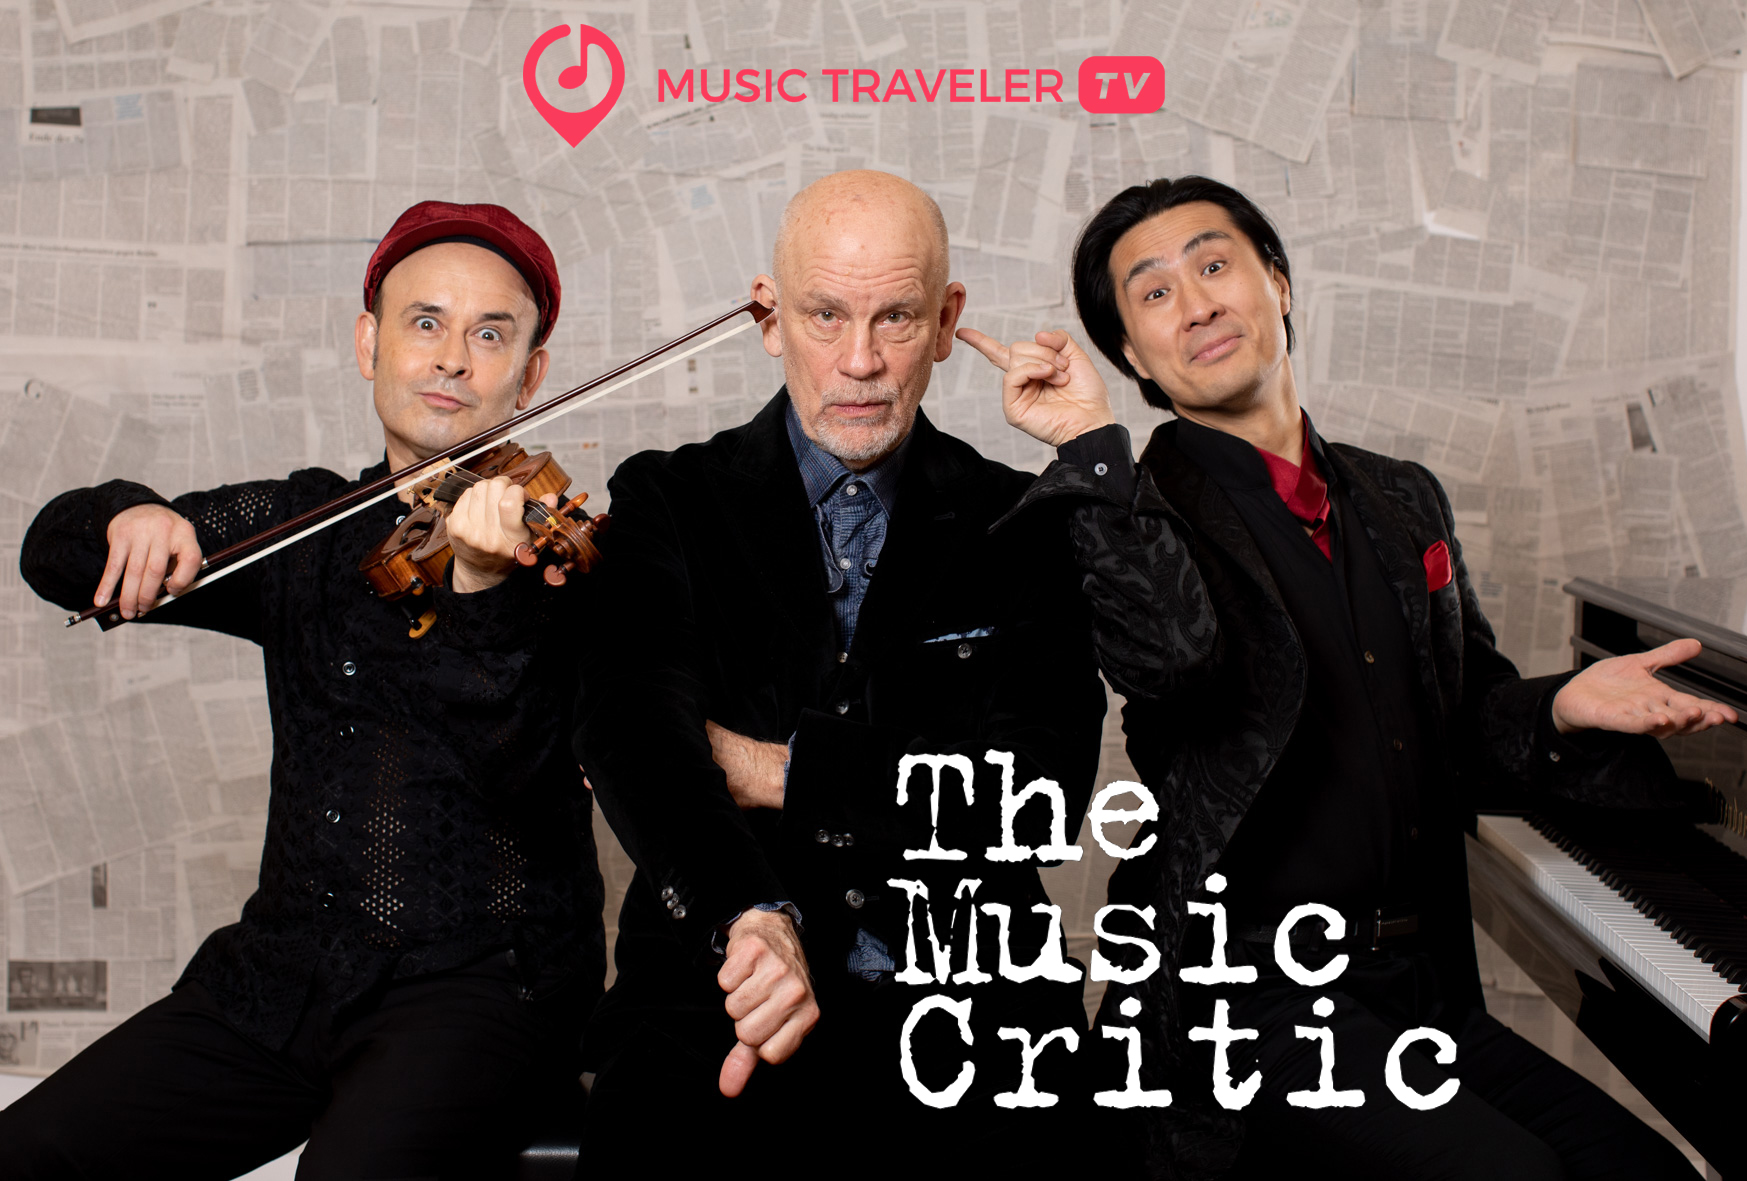 THE MUSIC CRITIC on MusicTraveler.tv!